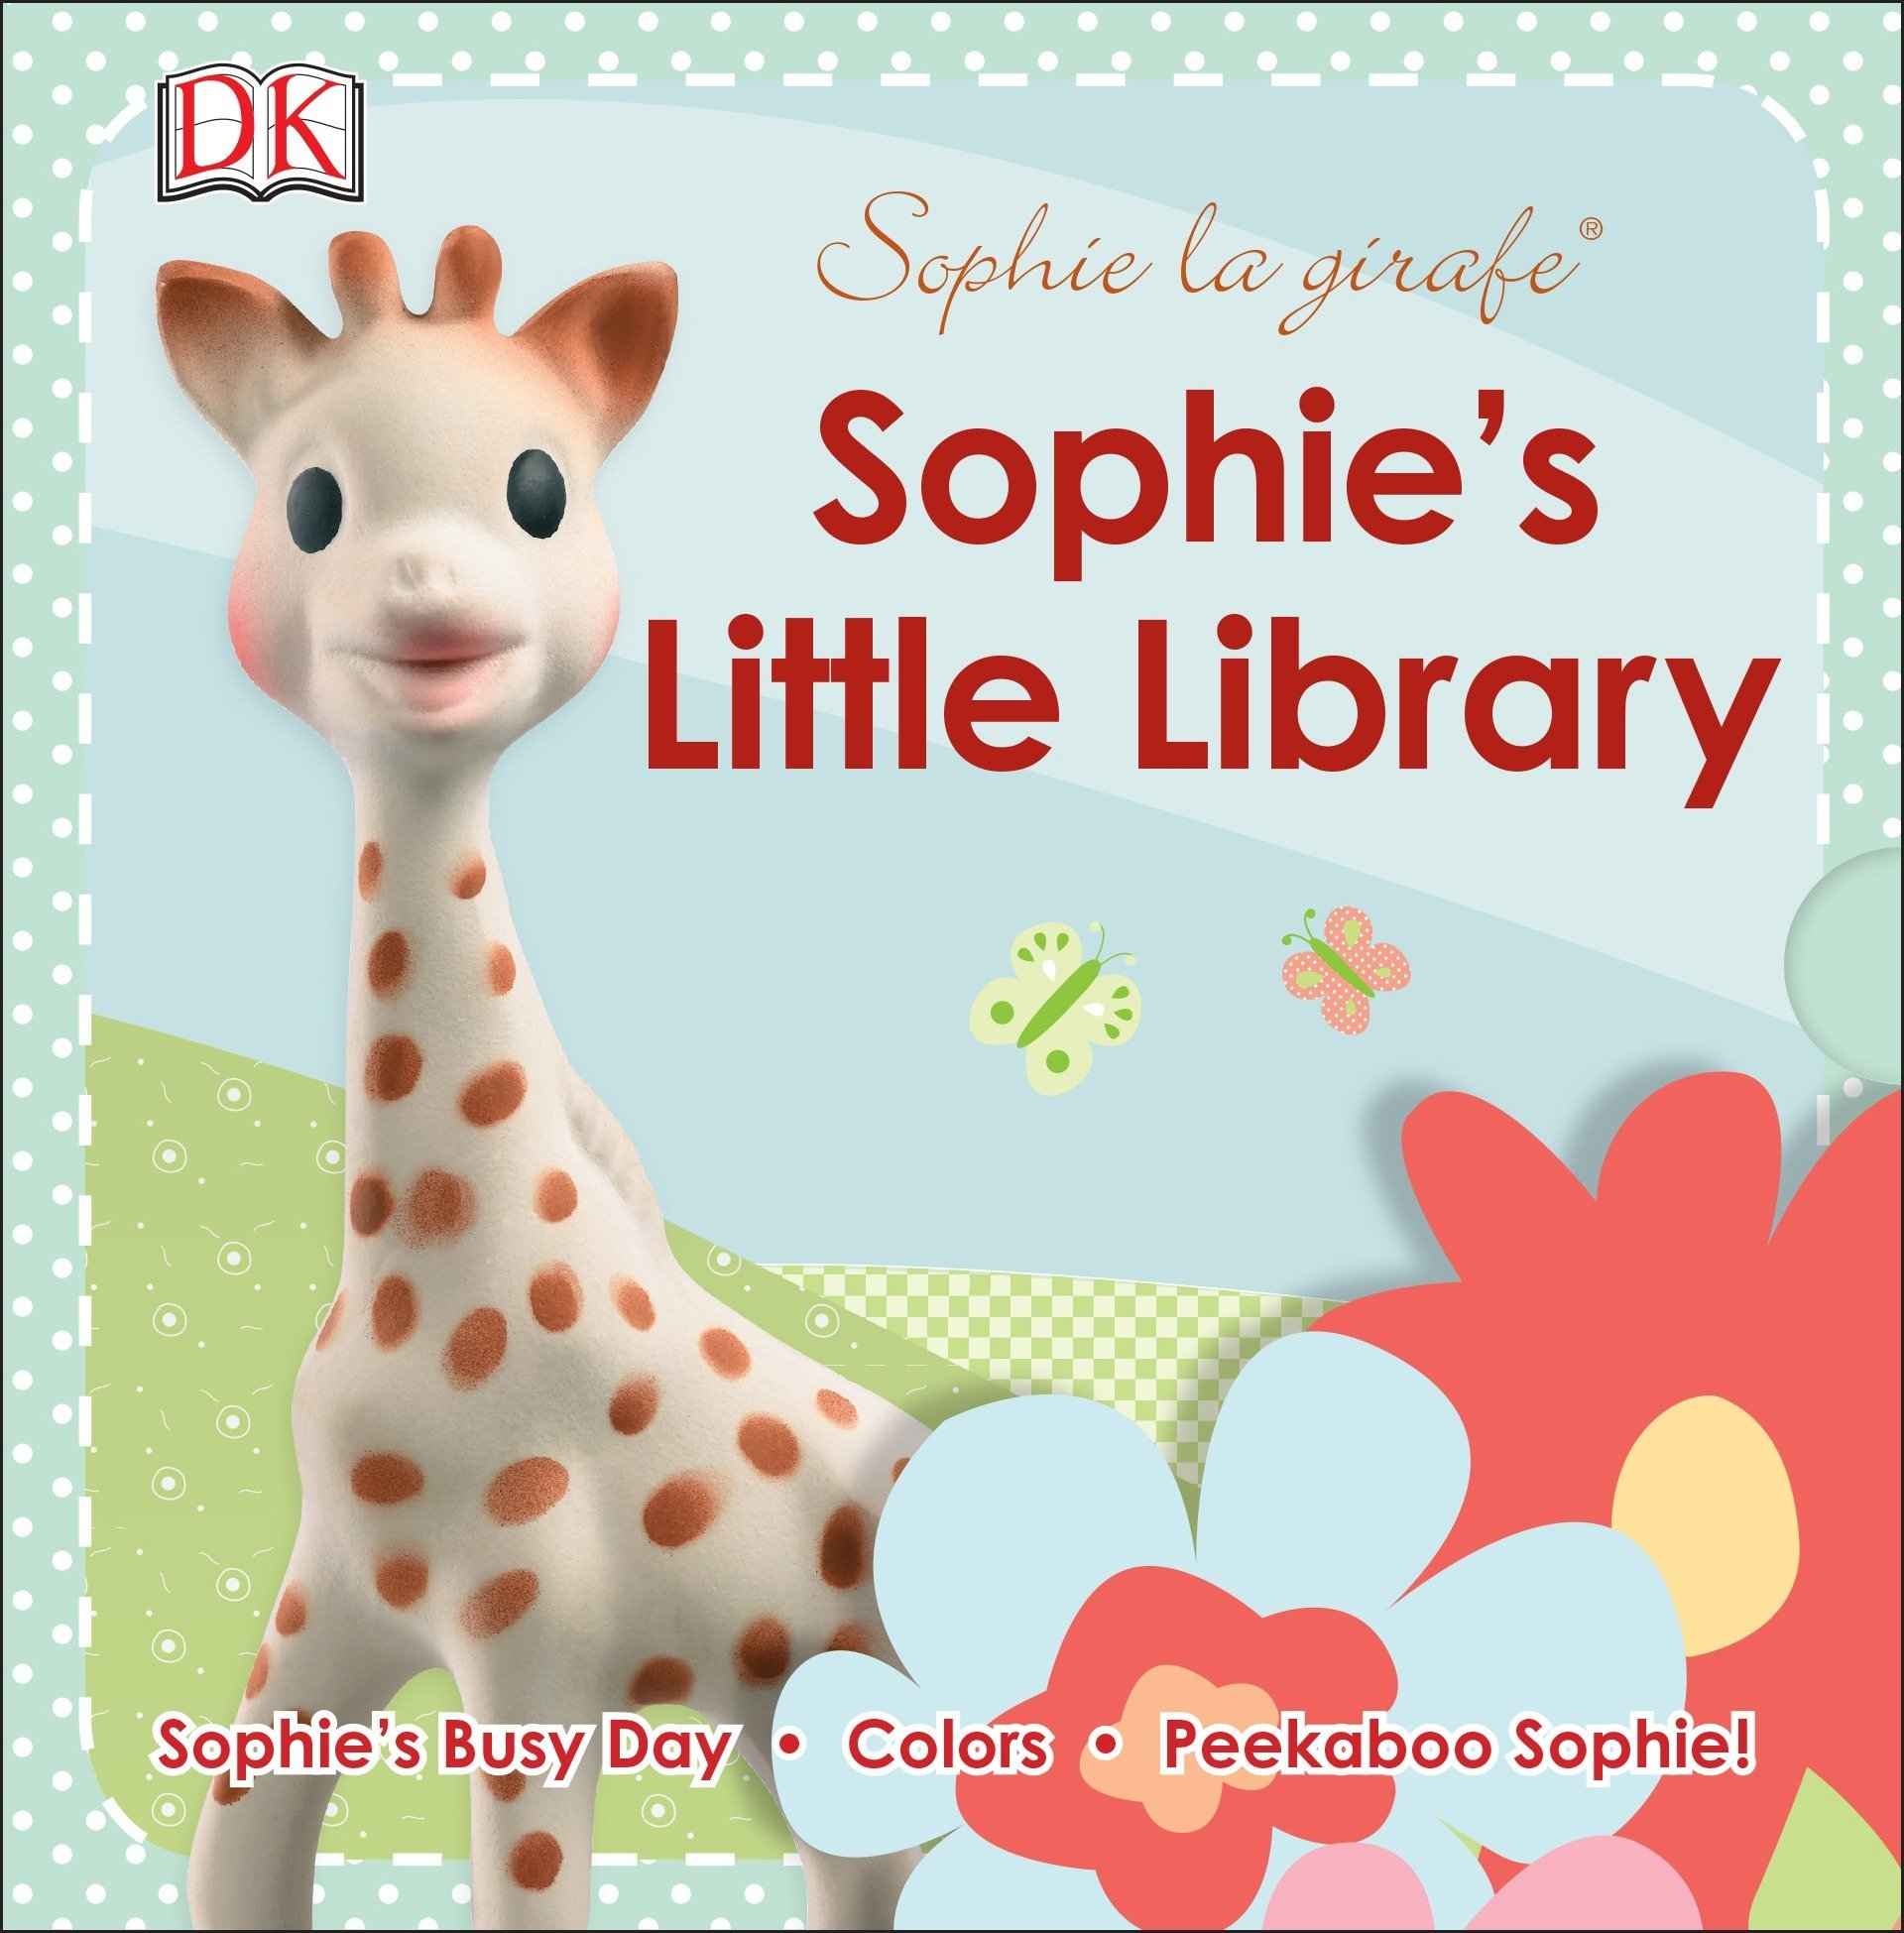 Sophie la girafe: Sophie's Little Library ebook